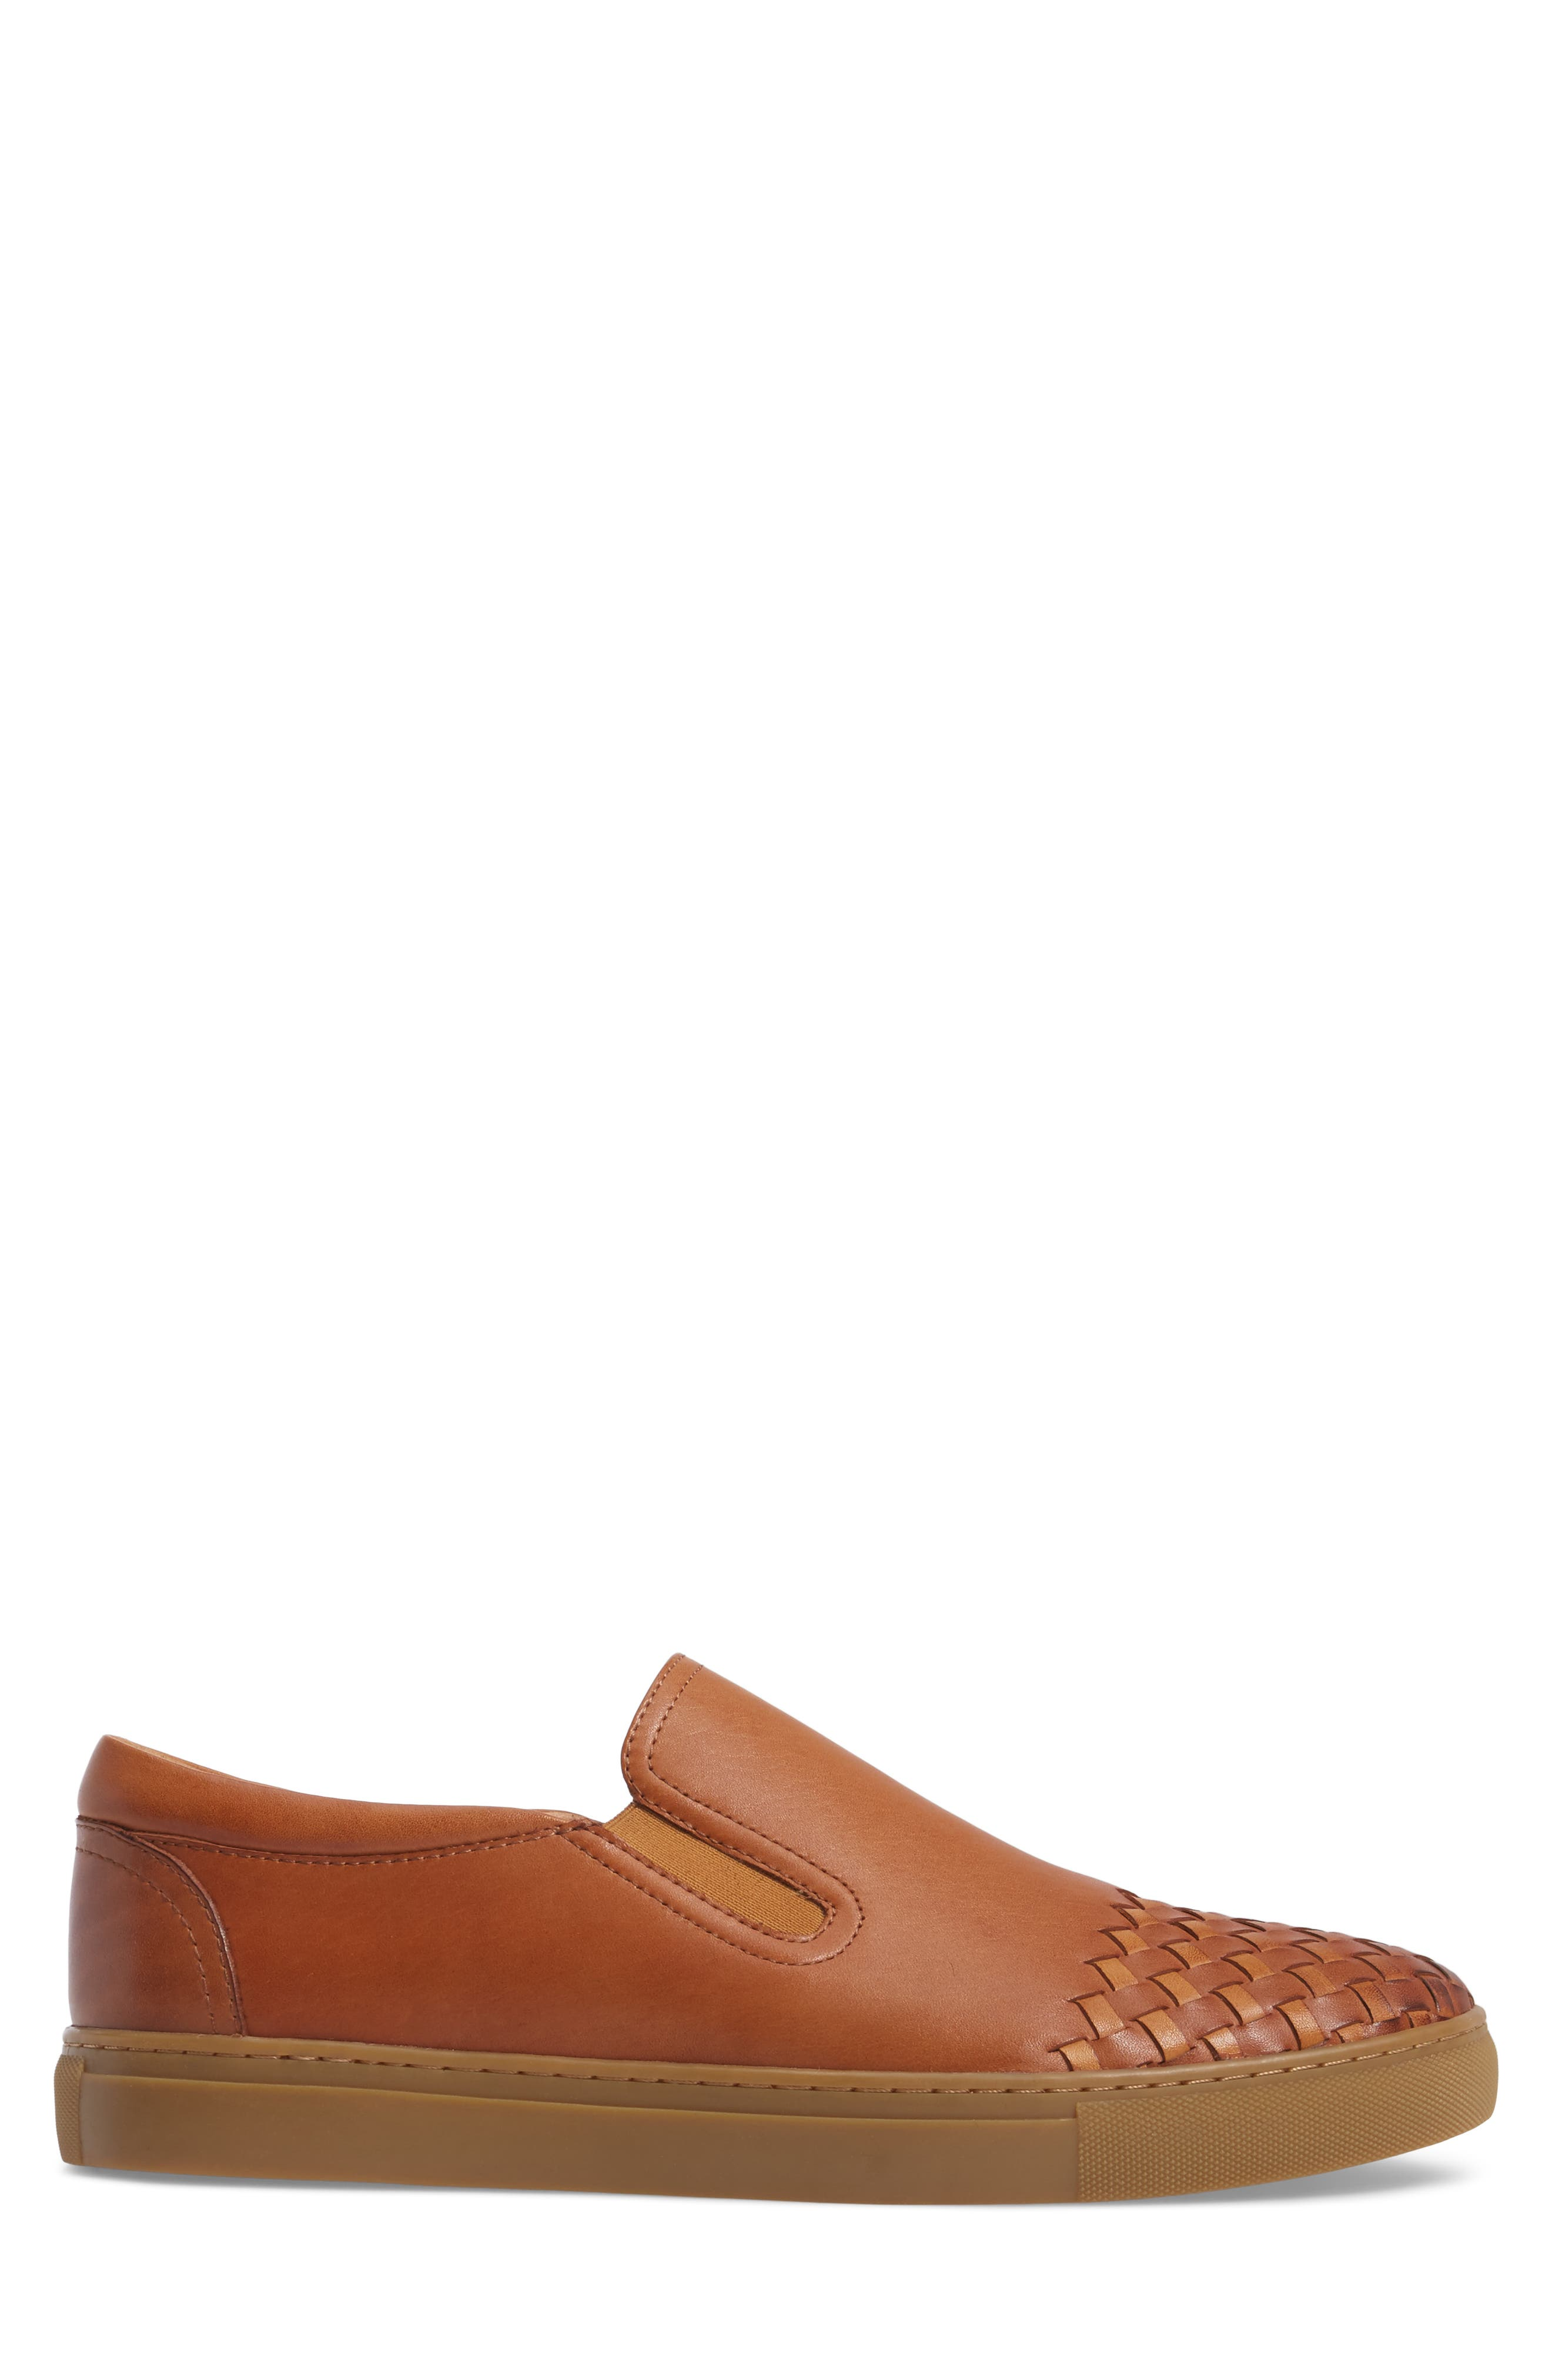 Ader Slip-On,                             Alternate thumbnail 3, color,                             Cognac Leather